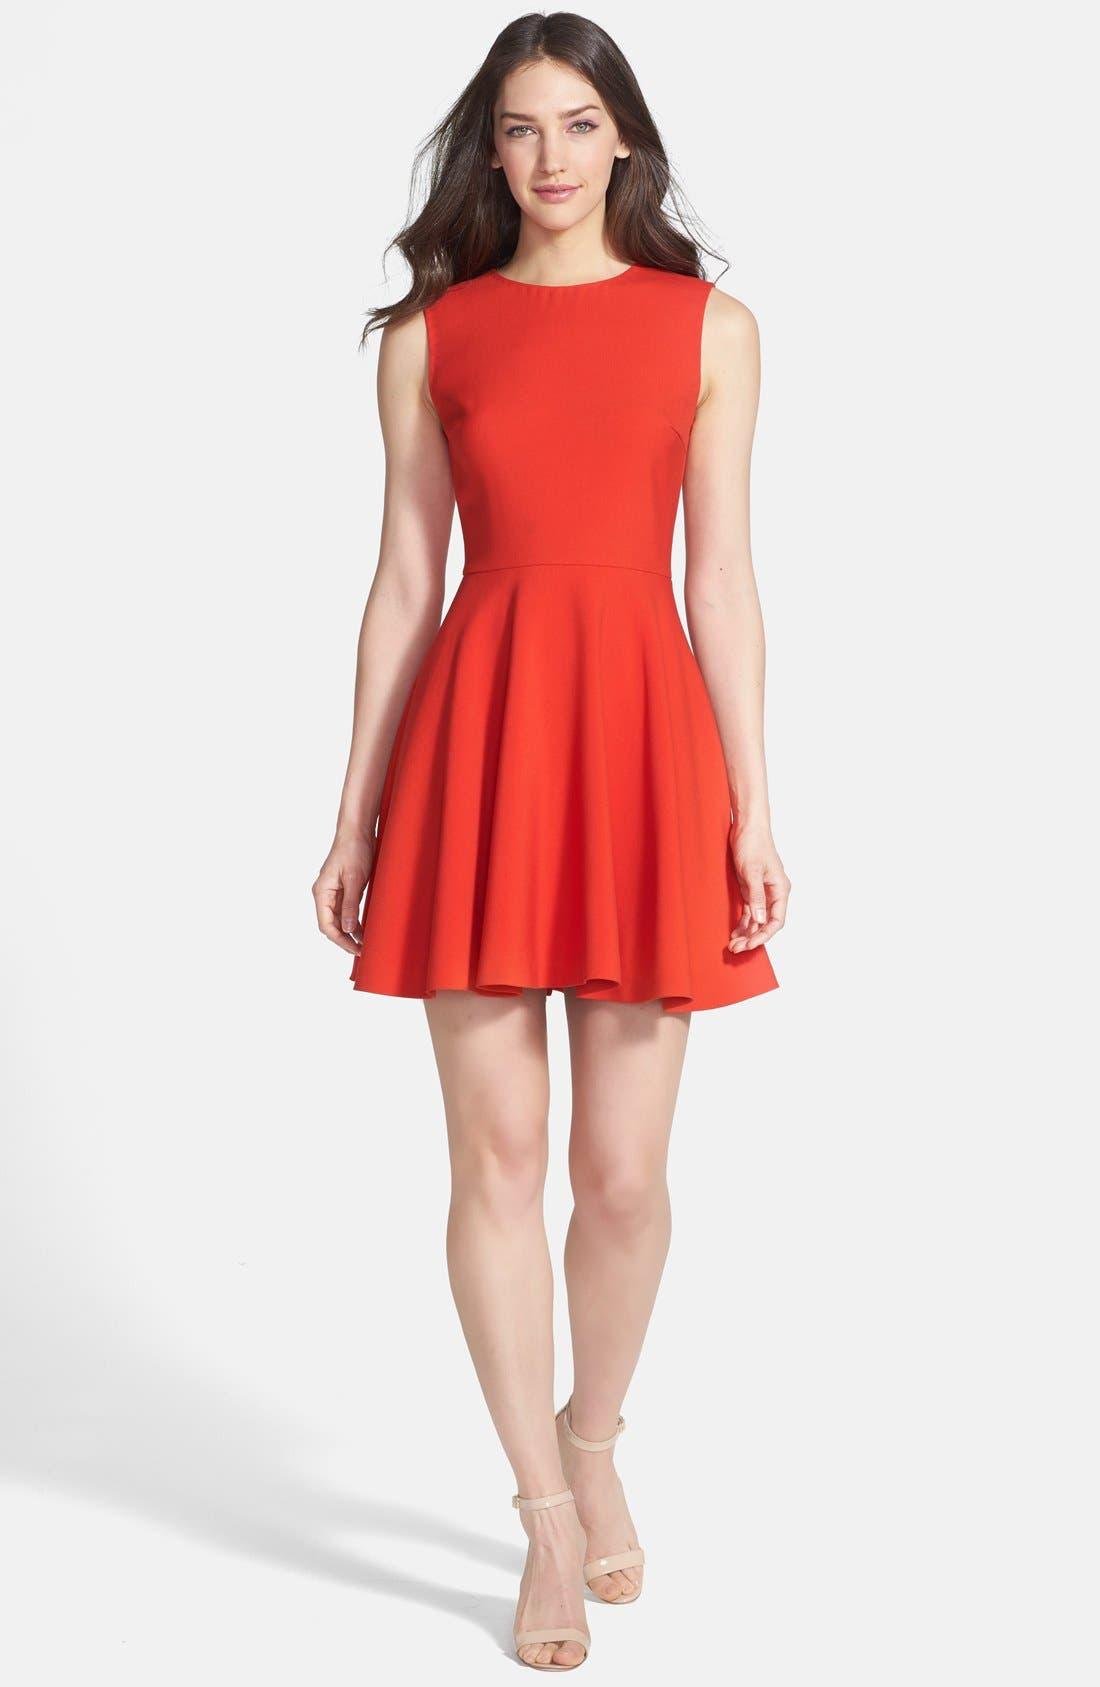 Alternate Image 1 Selected - Diane von Furstenberg 'Jeannie' Stretch Fit & Flare Dress